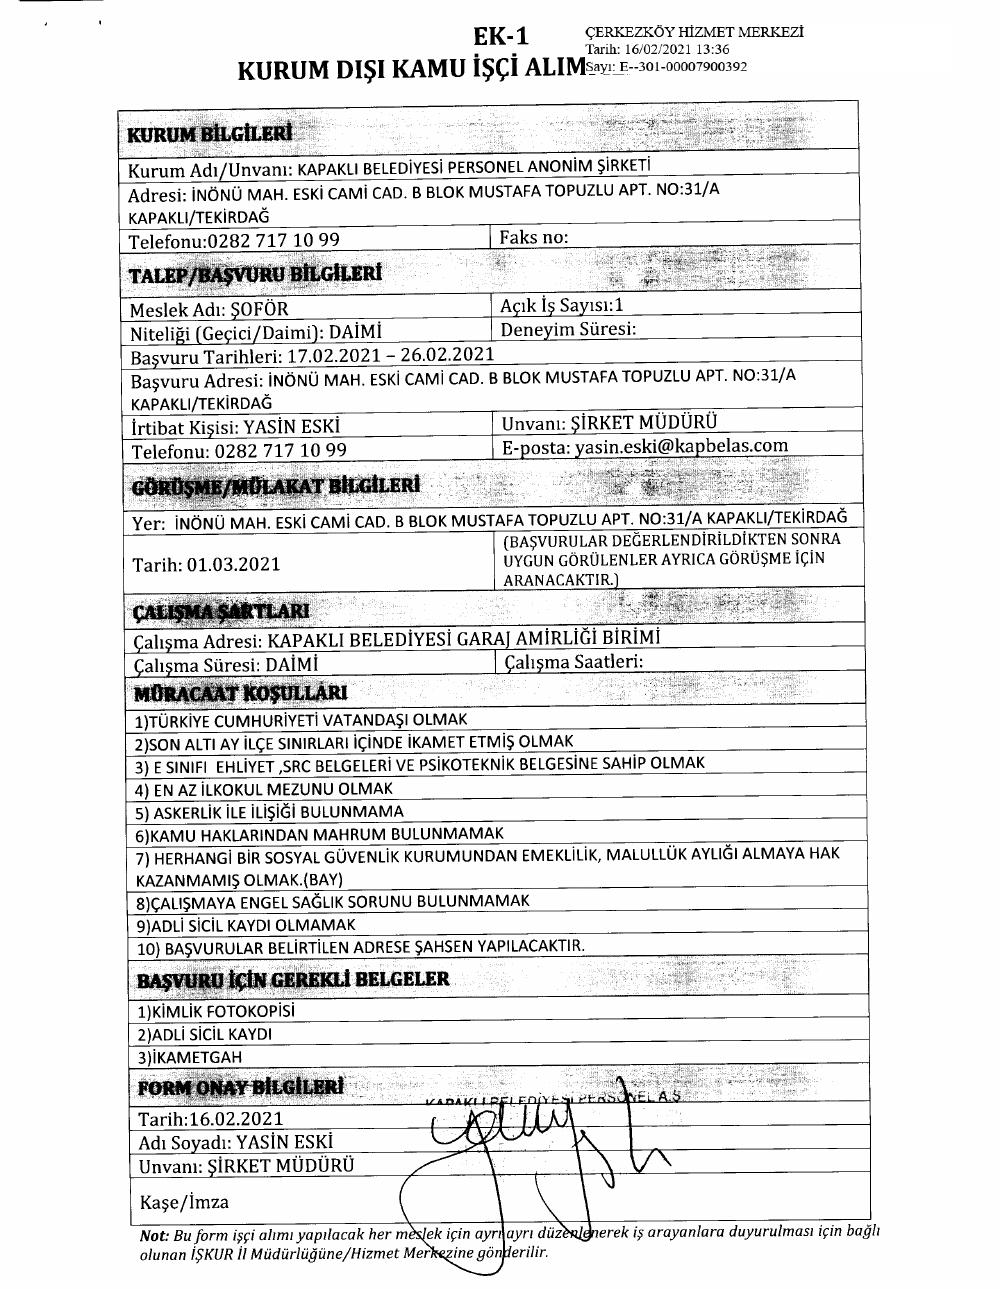 tekirdag-kapakli-belediyesi-per-a-s-26-02-2021-000001.png